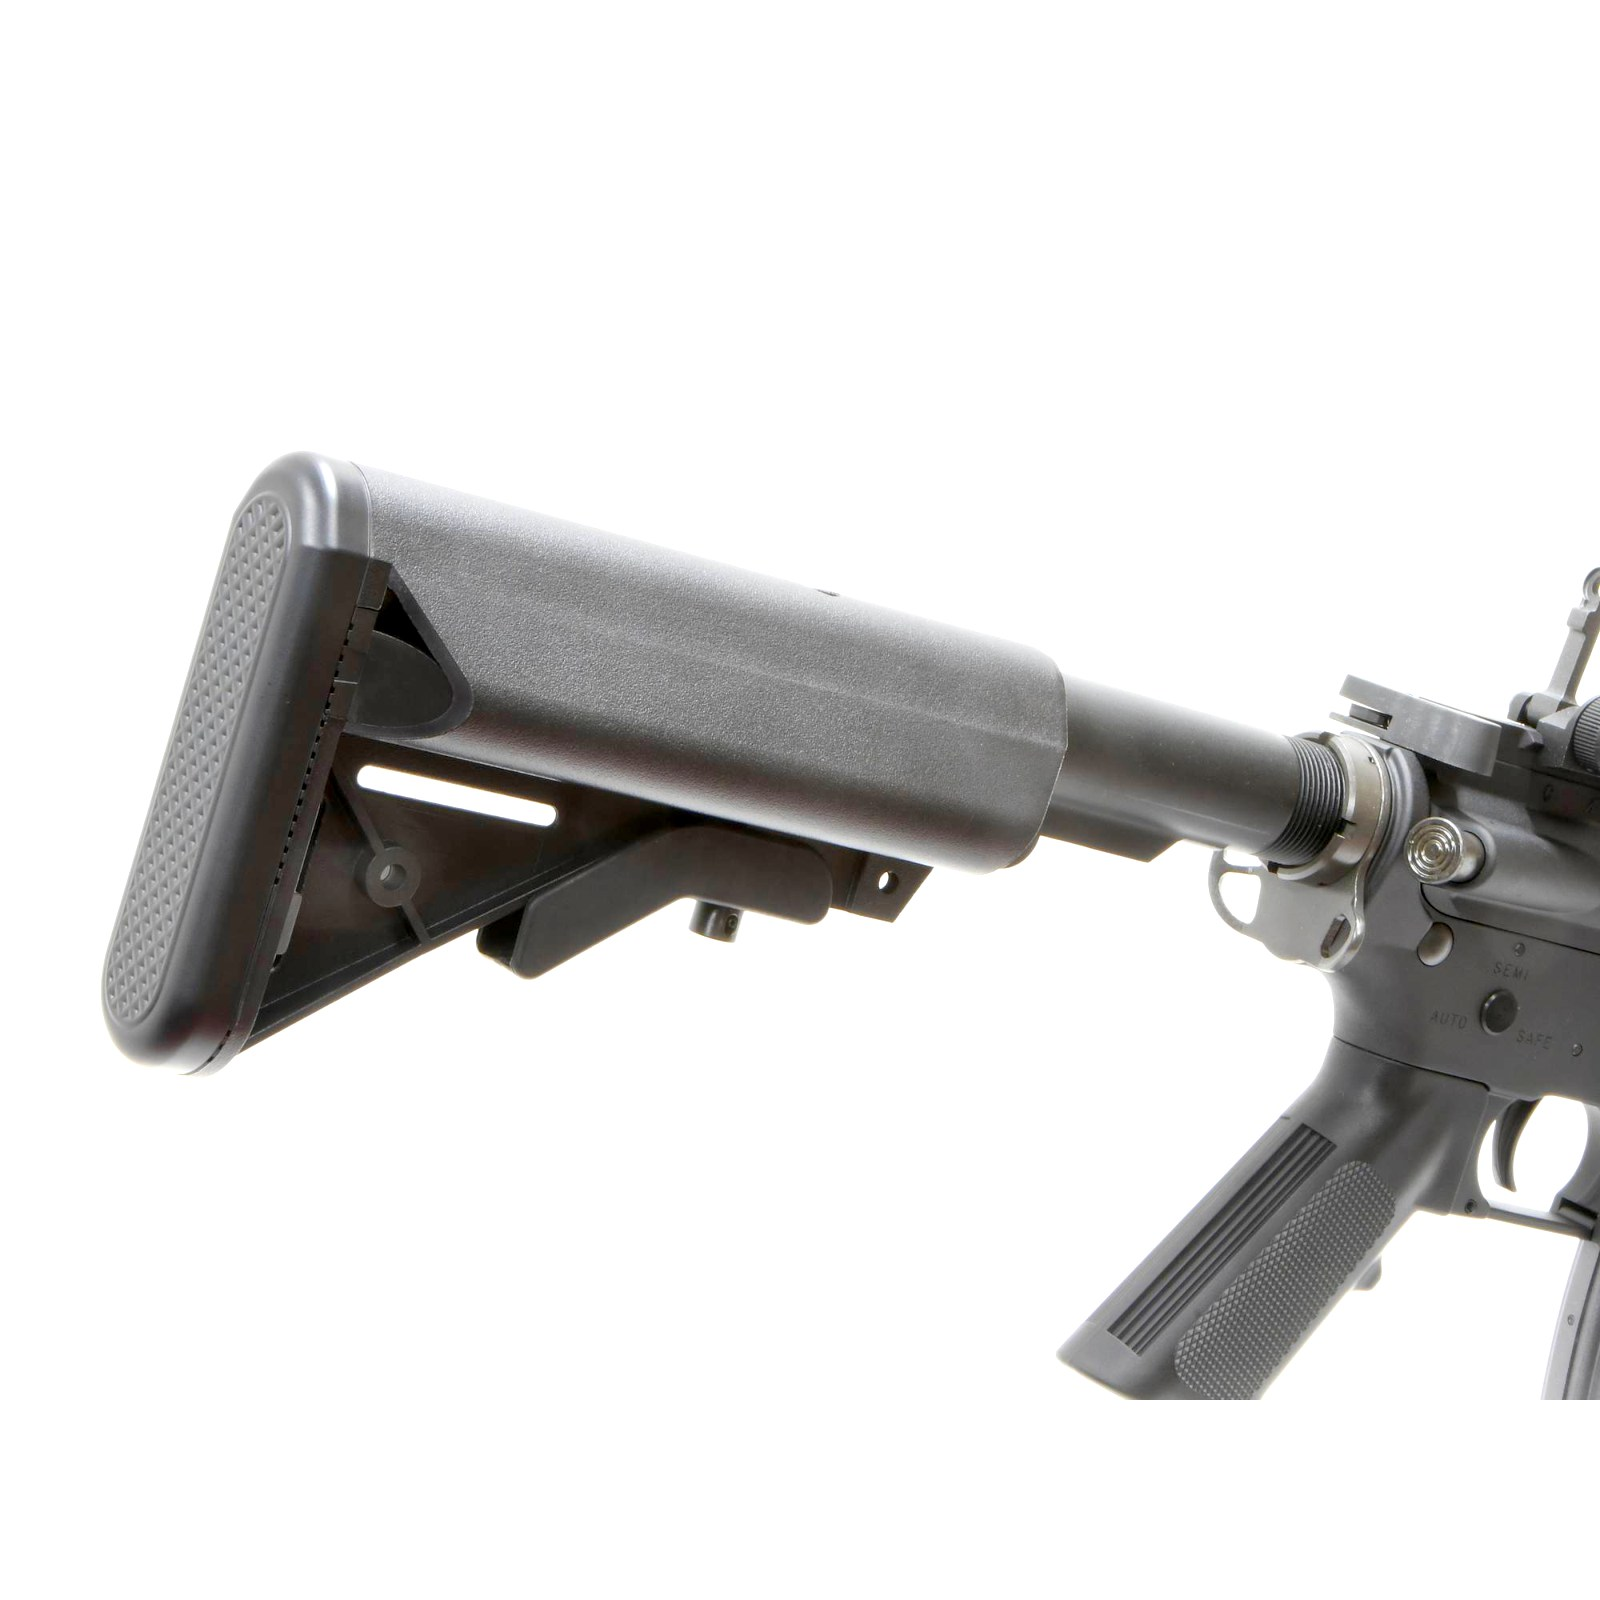 VFC 電動ガン COLT M4 RIS2 COLT&DD Licensed *MILブラック/日本仕様/コルト・ダニエルディフェンスライセンス品 【品番:VF1-LM4RIS2-TB01】